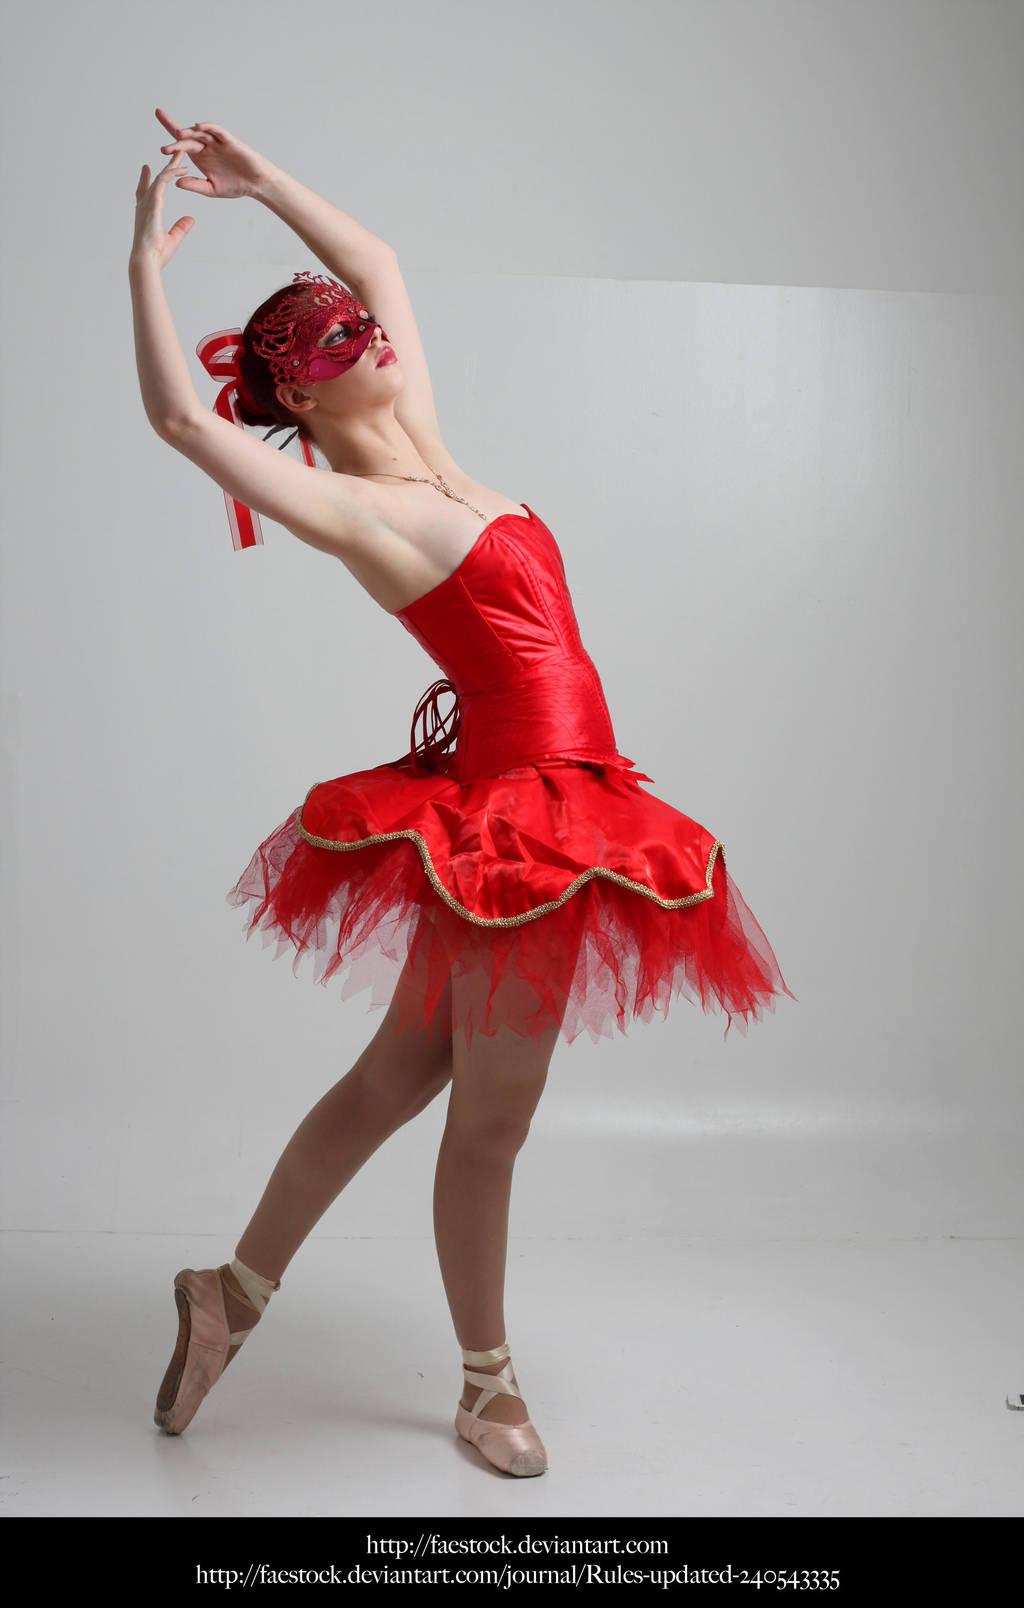 Dancer 25 by faestock